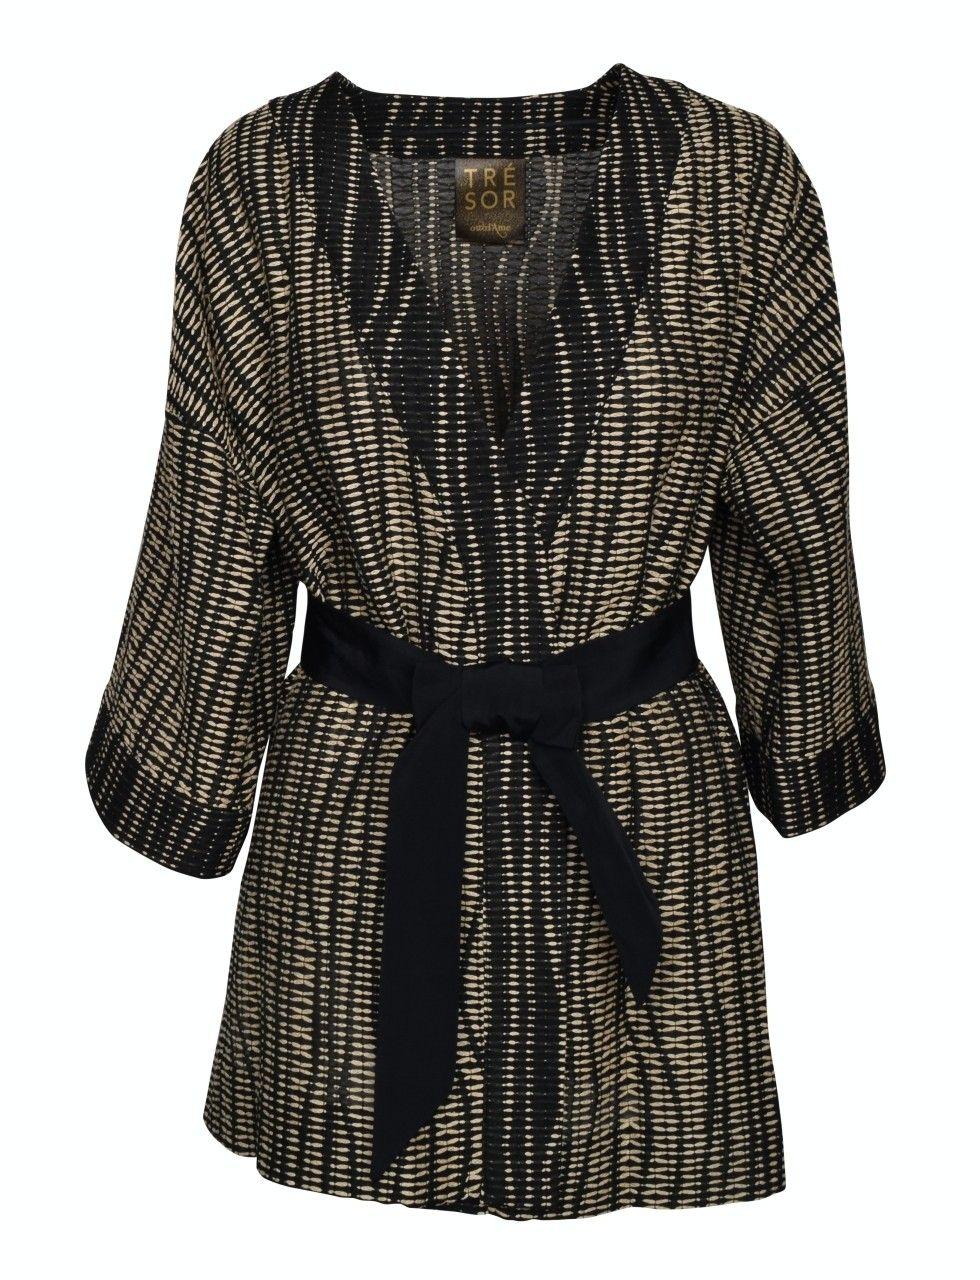 OTTOD´AME - Damen Kimono - Camicia - Shirt - Schwarz/Camel